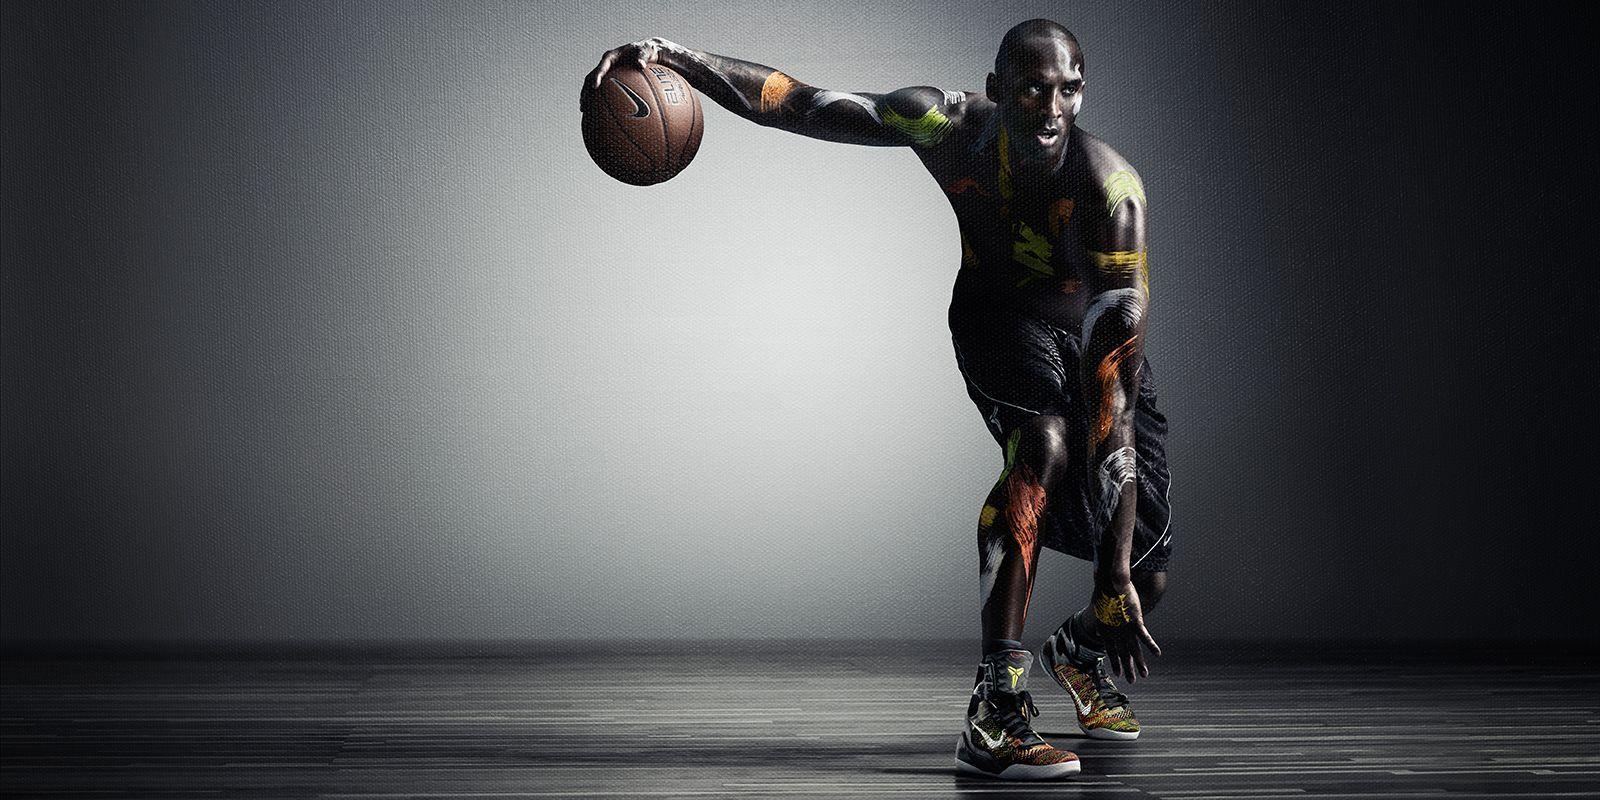 Nike Kobe 11 Low Men's Basketball Shoes Kobe Bryant Cool